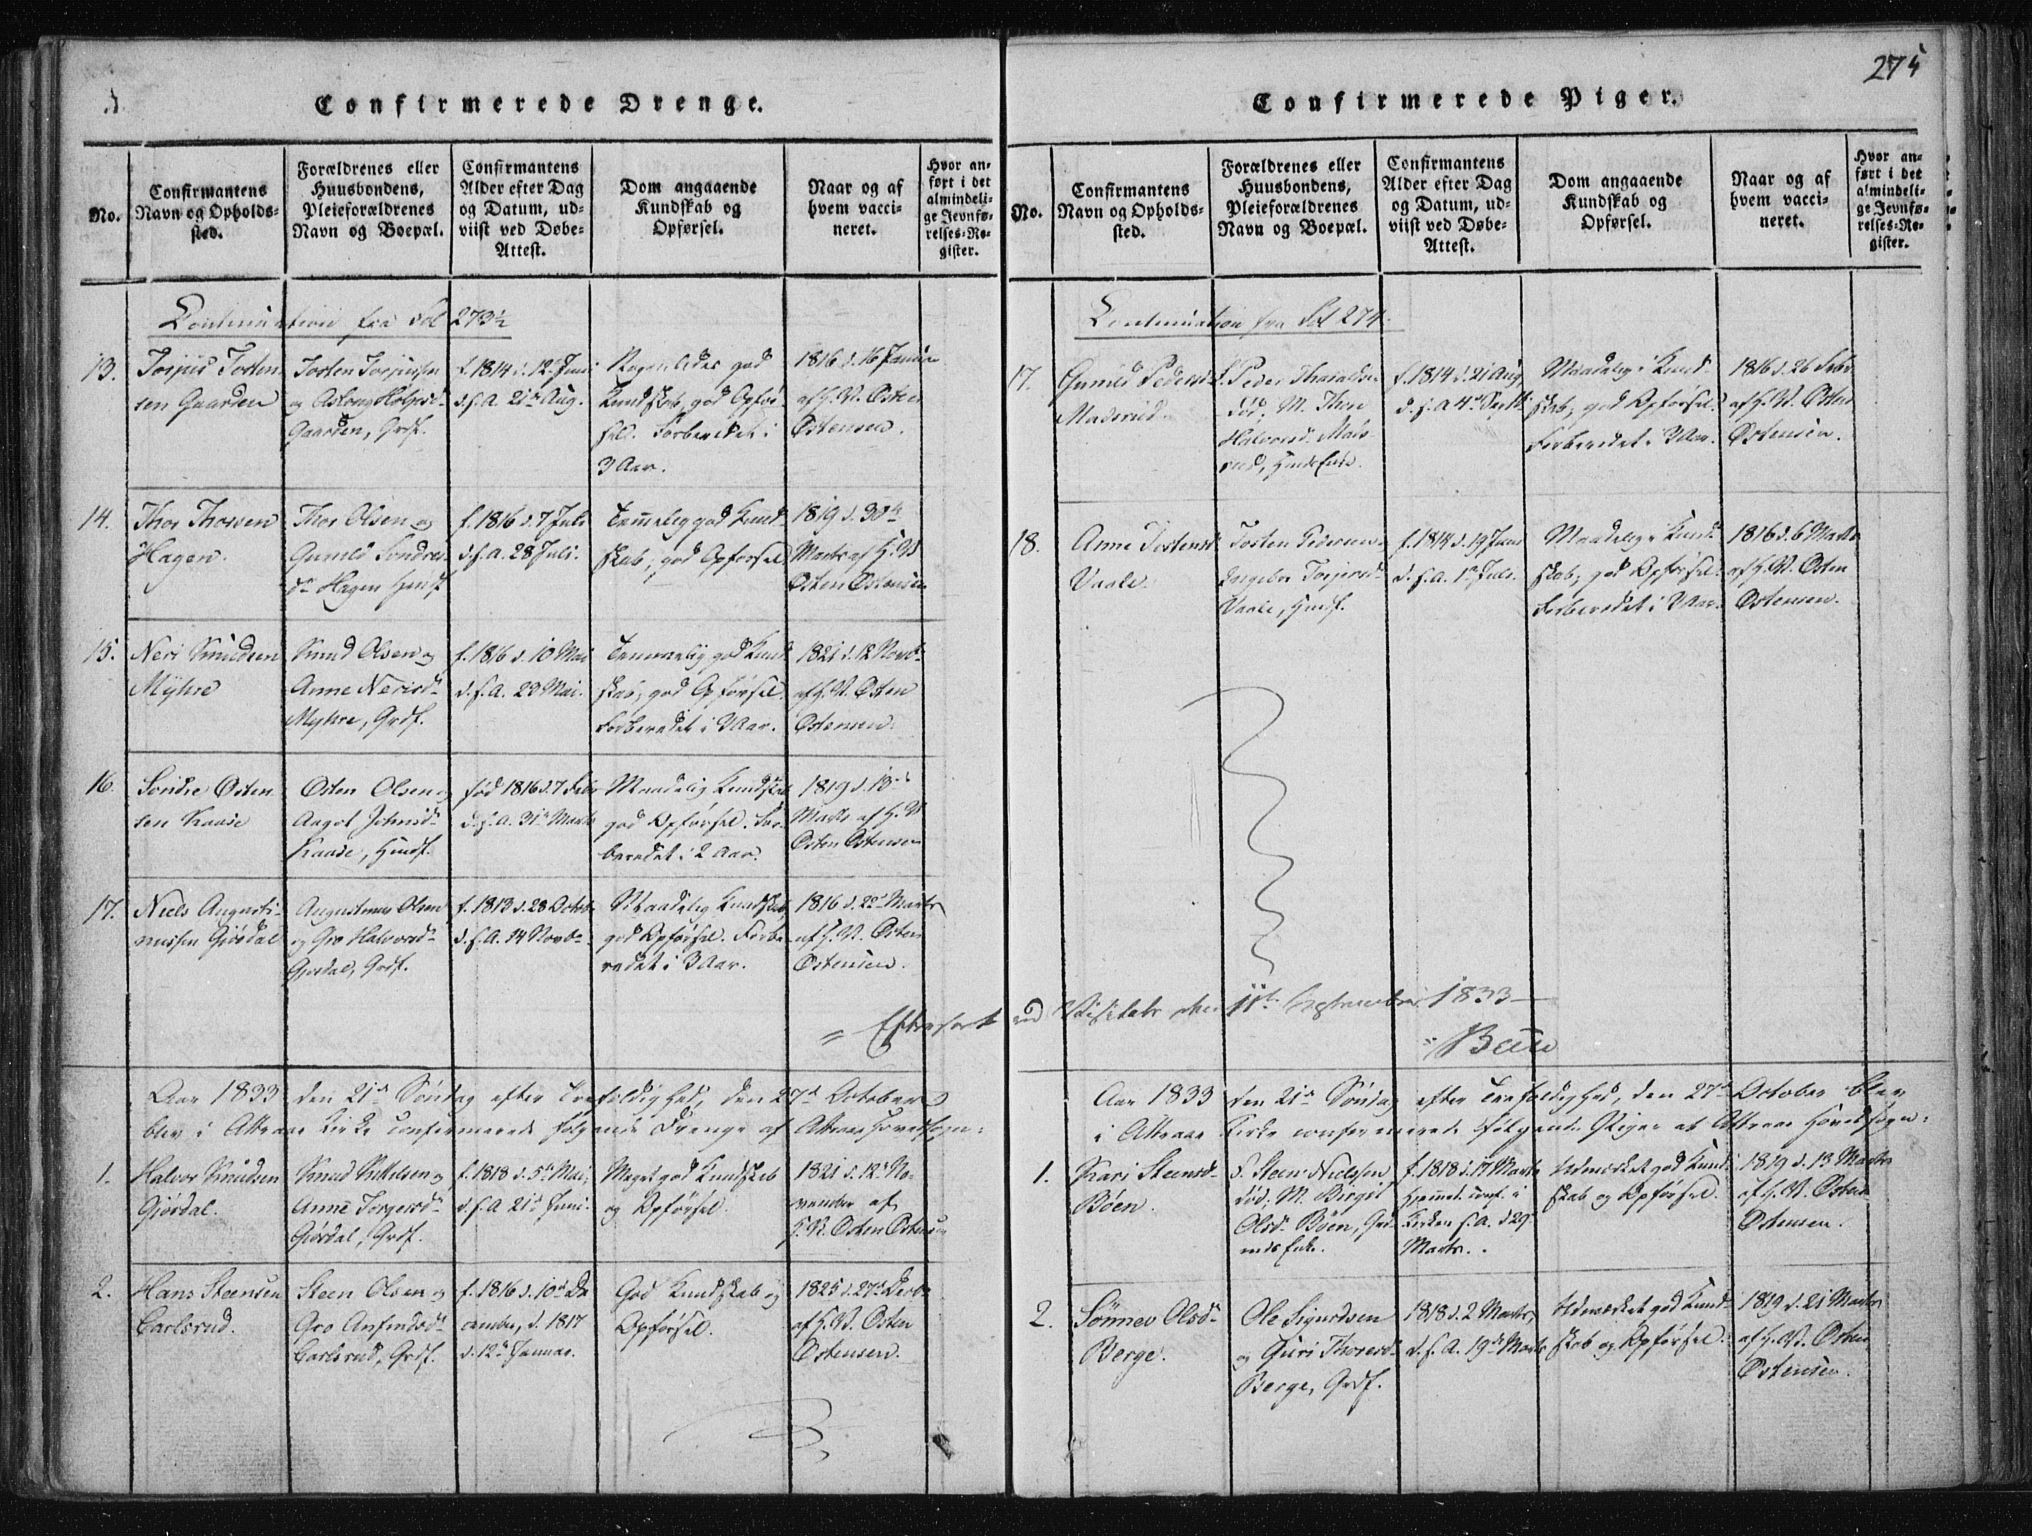 SAKO, Tinn kirkebøker, F/Fa/L0004: Ministerialbok nr. I 4, 1815-1843, s. 275